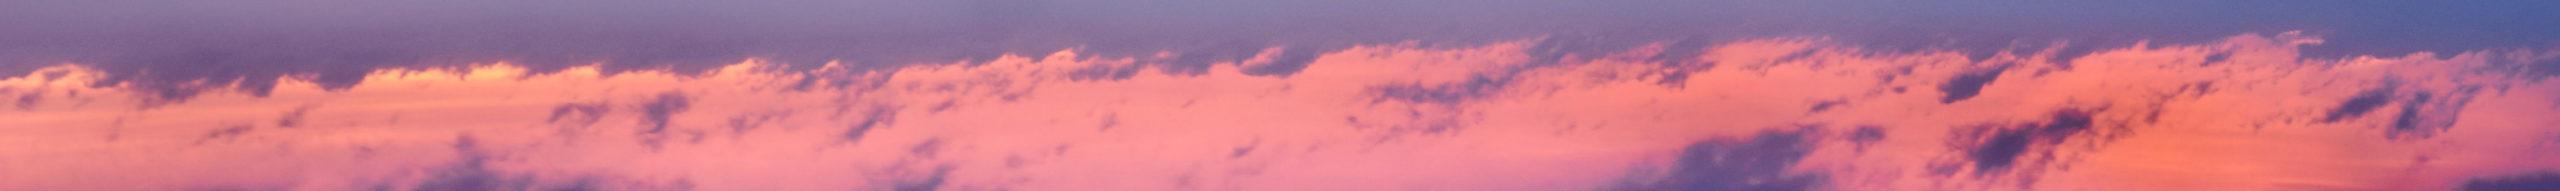 Purple-sky_-hakan-aldrin-X5-dP5zWYtY-unsplash